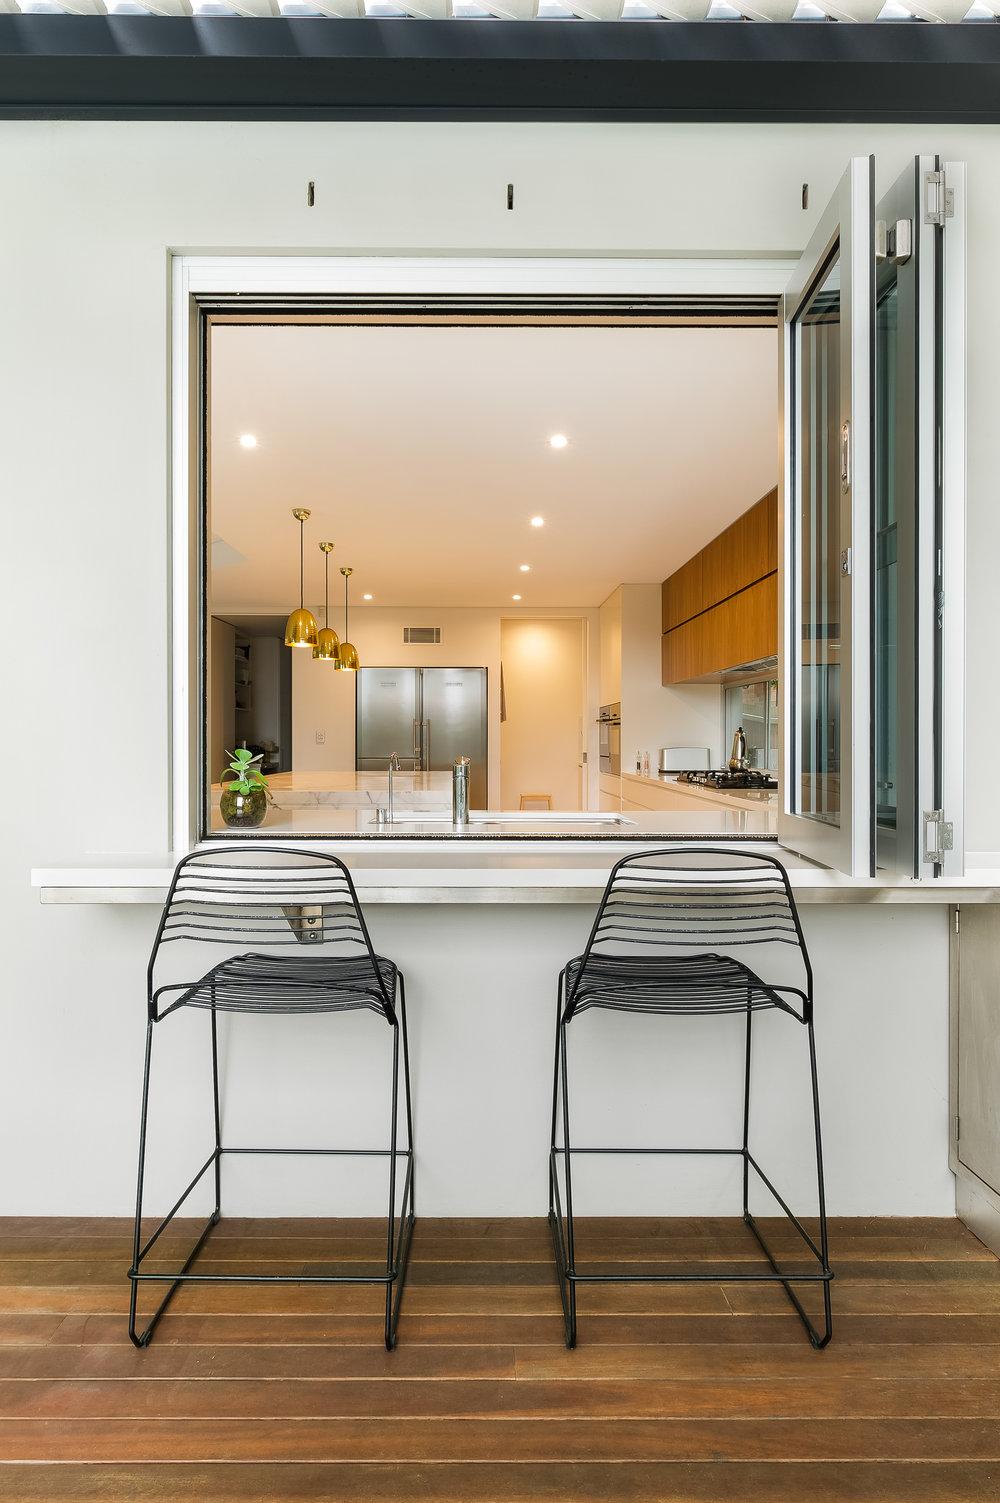 Kiama Shellharbour Gerringong Berry Wollongong South Coast Illawarra Commercial Photographer, architectural photographer, real estate photographer - kitchen